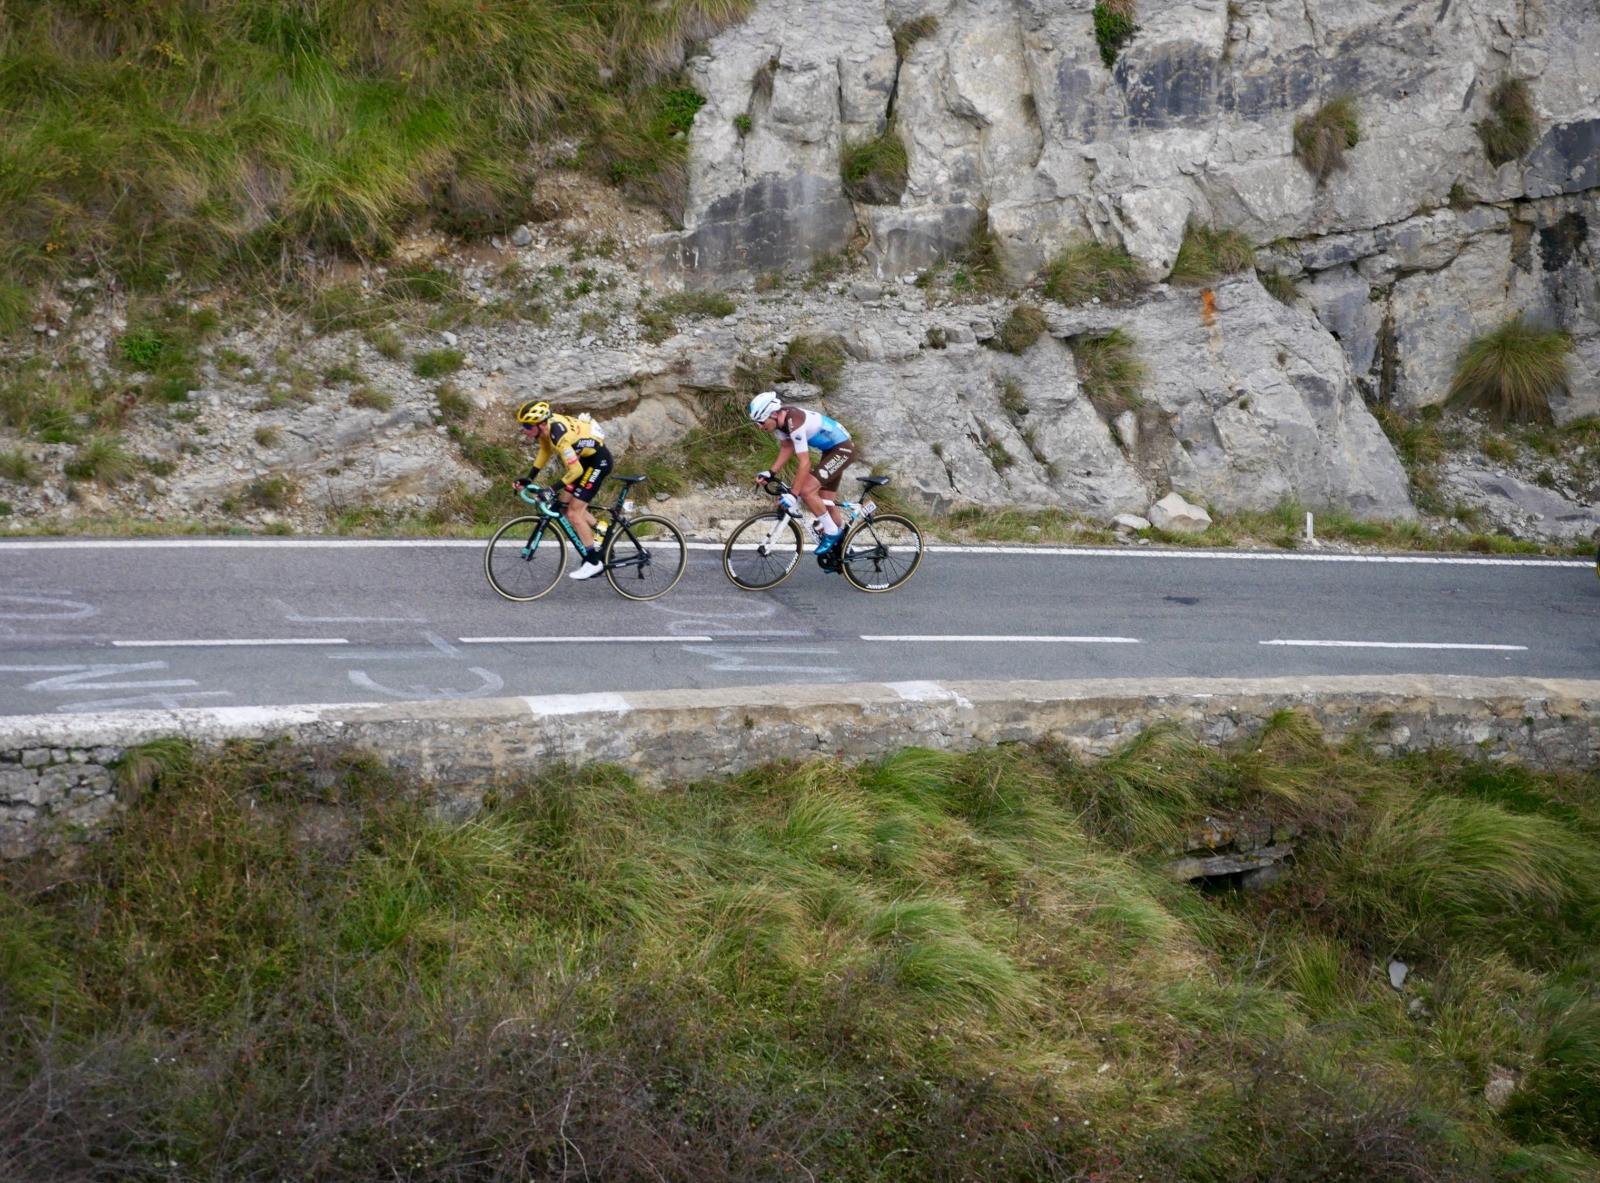 Nans Peters   La Vuelta ciclista a España - Stage 8